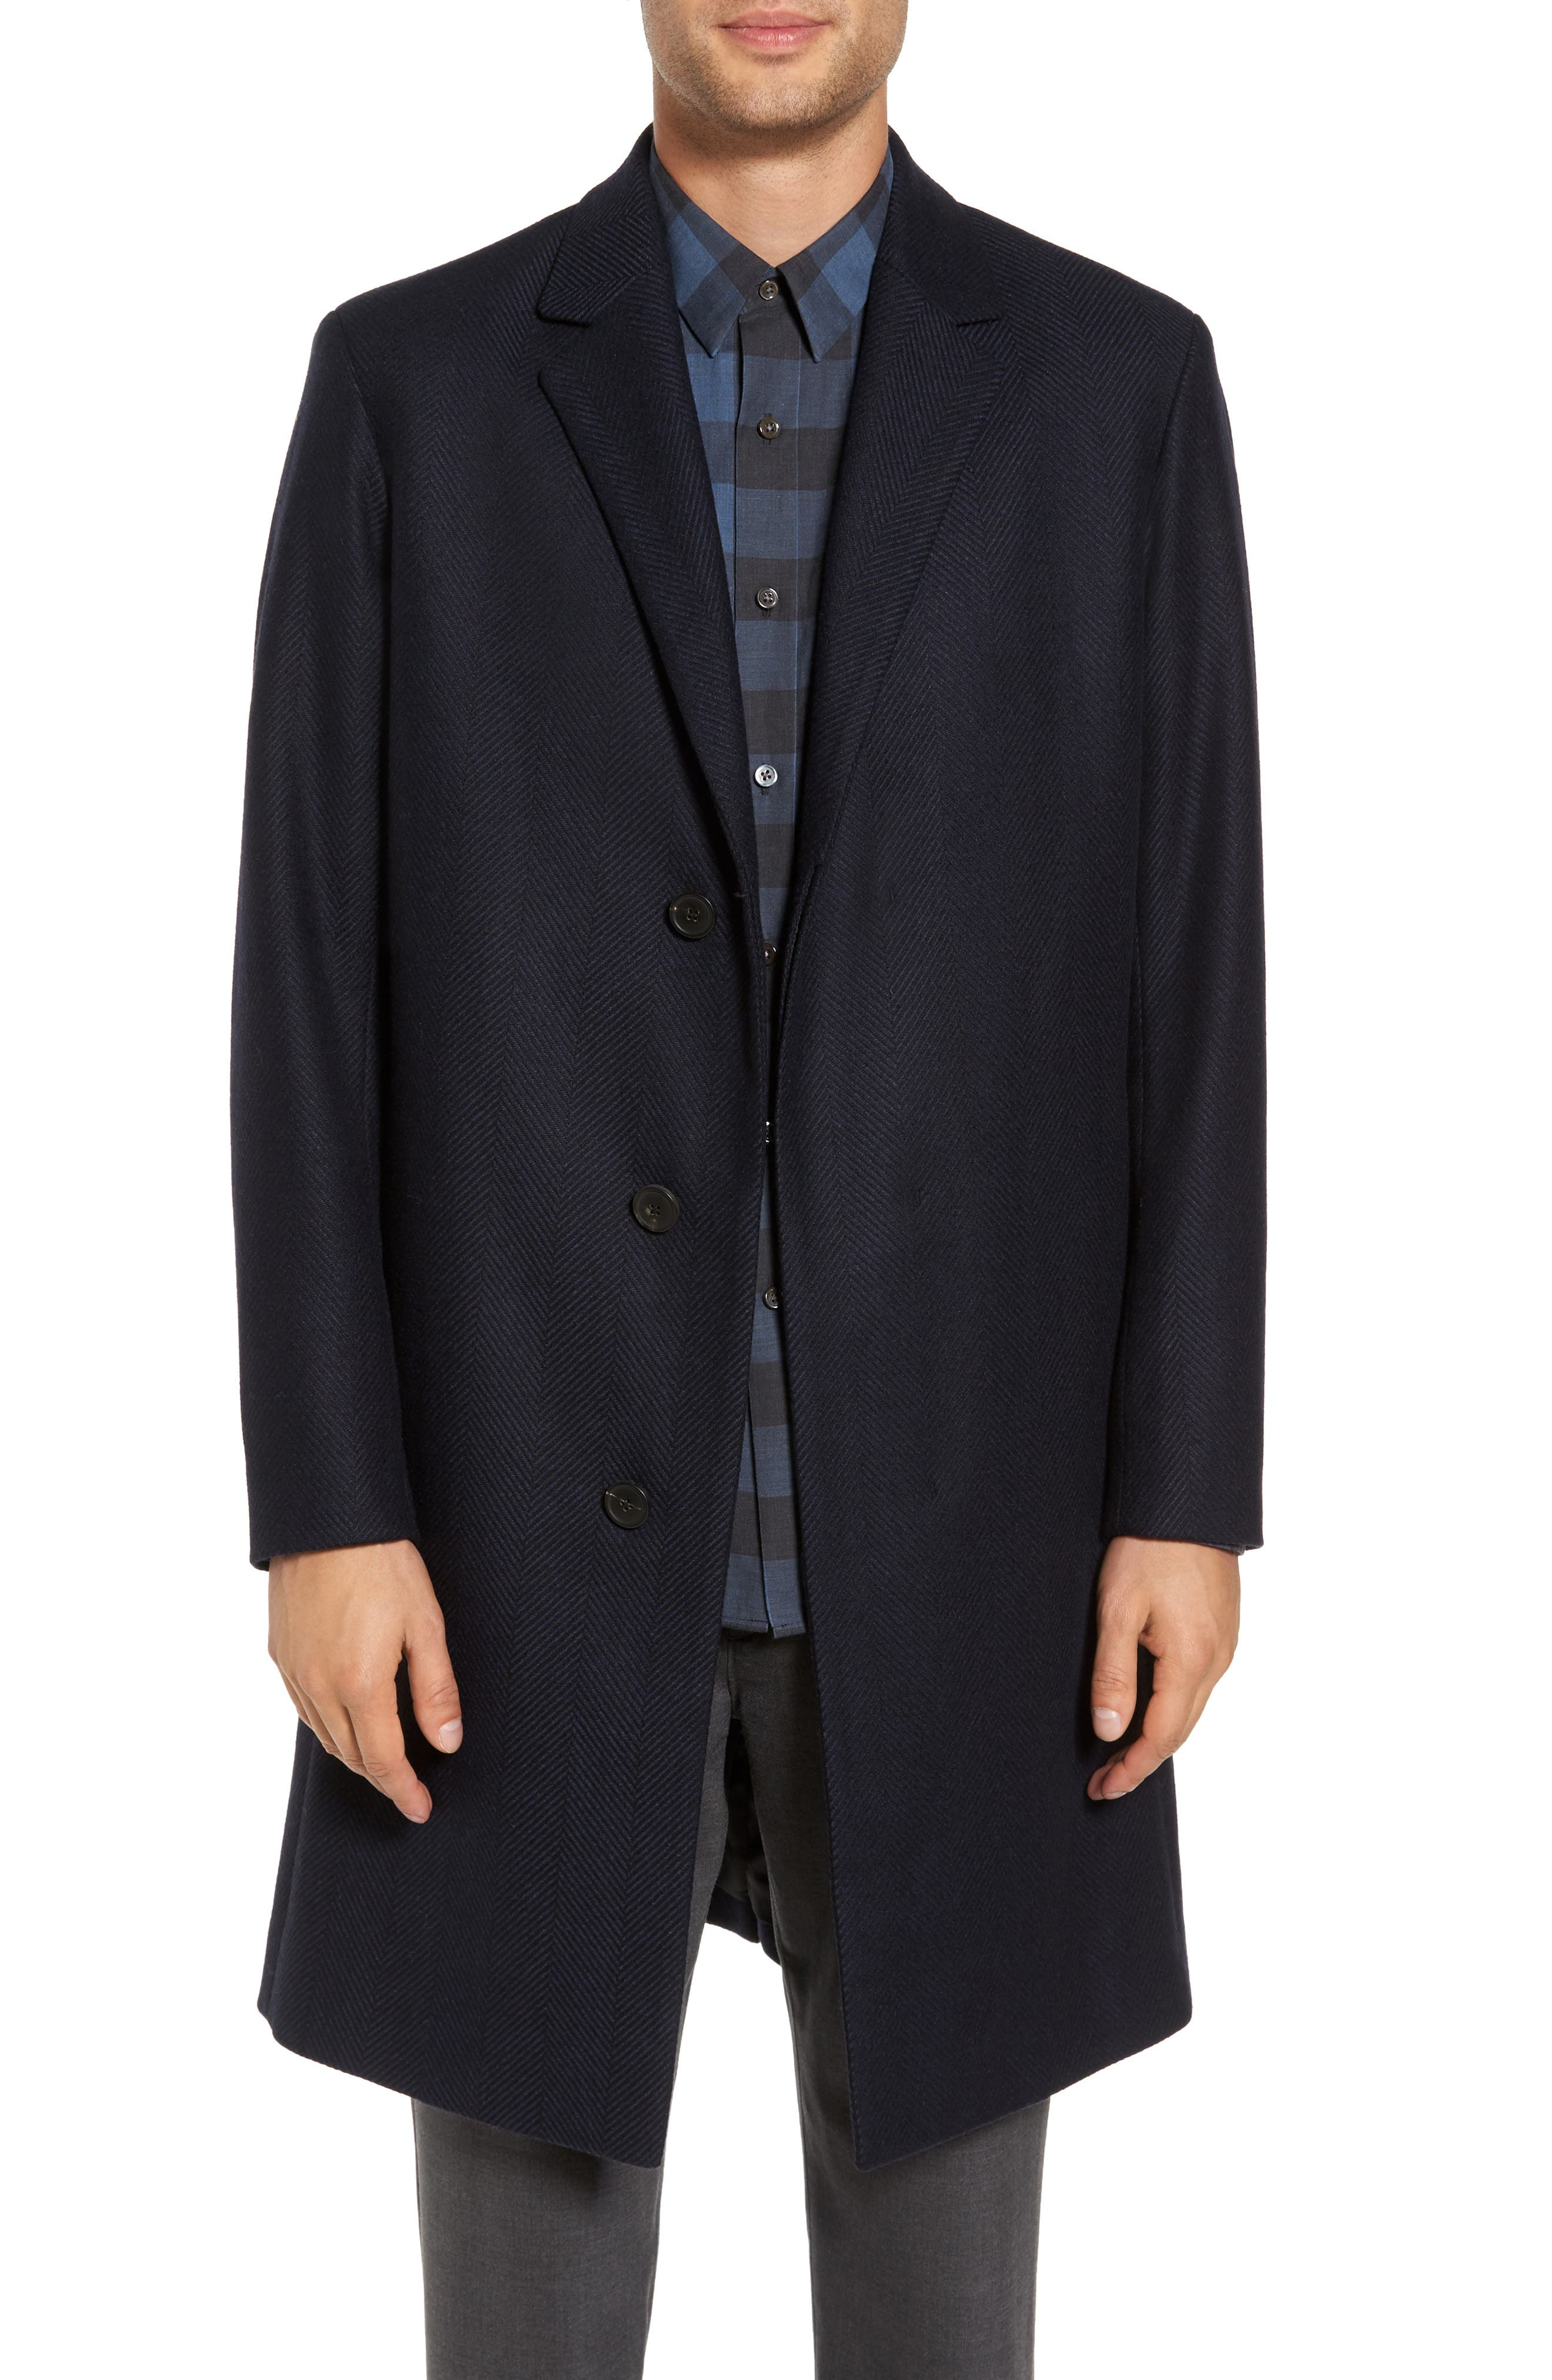 Alternate Image 1 Selected - Theory Bower Herringbone Wool Blend Topcoat